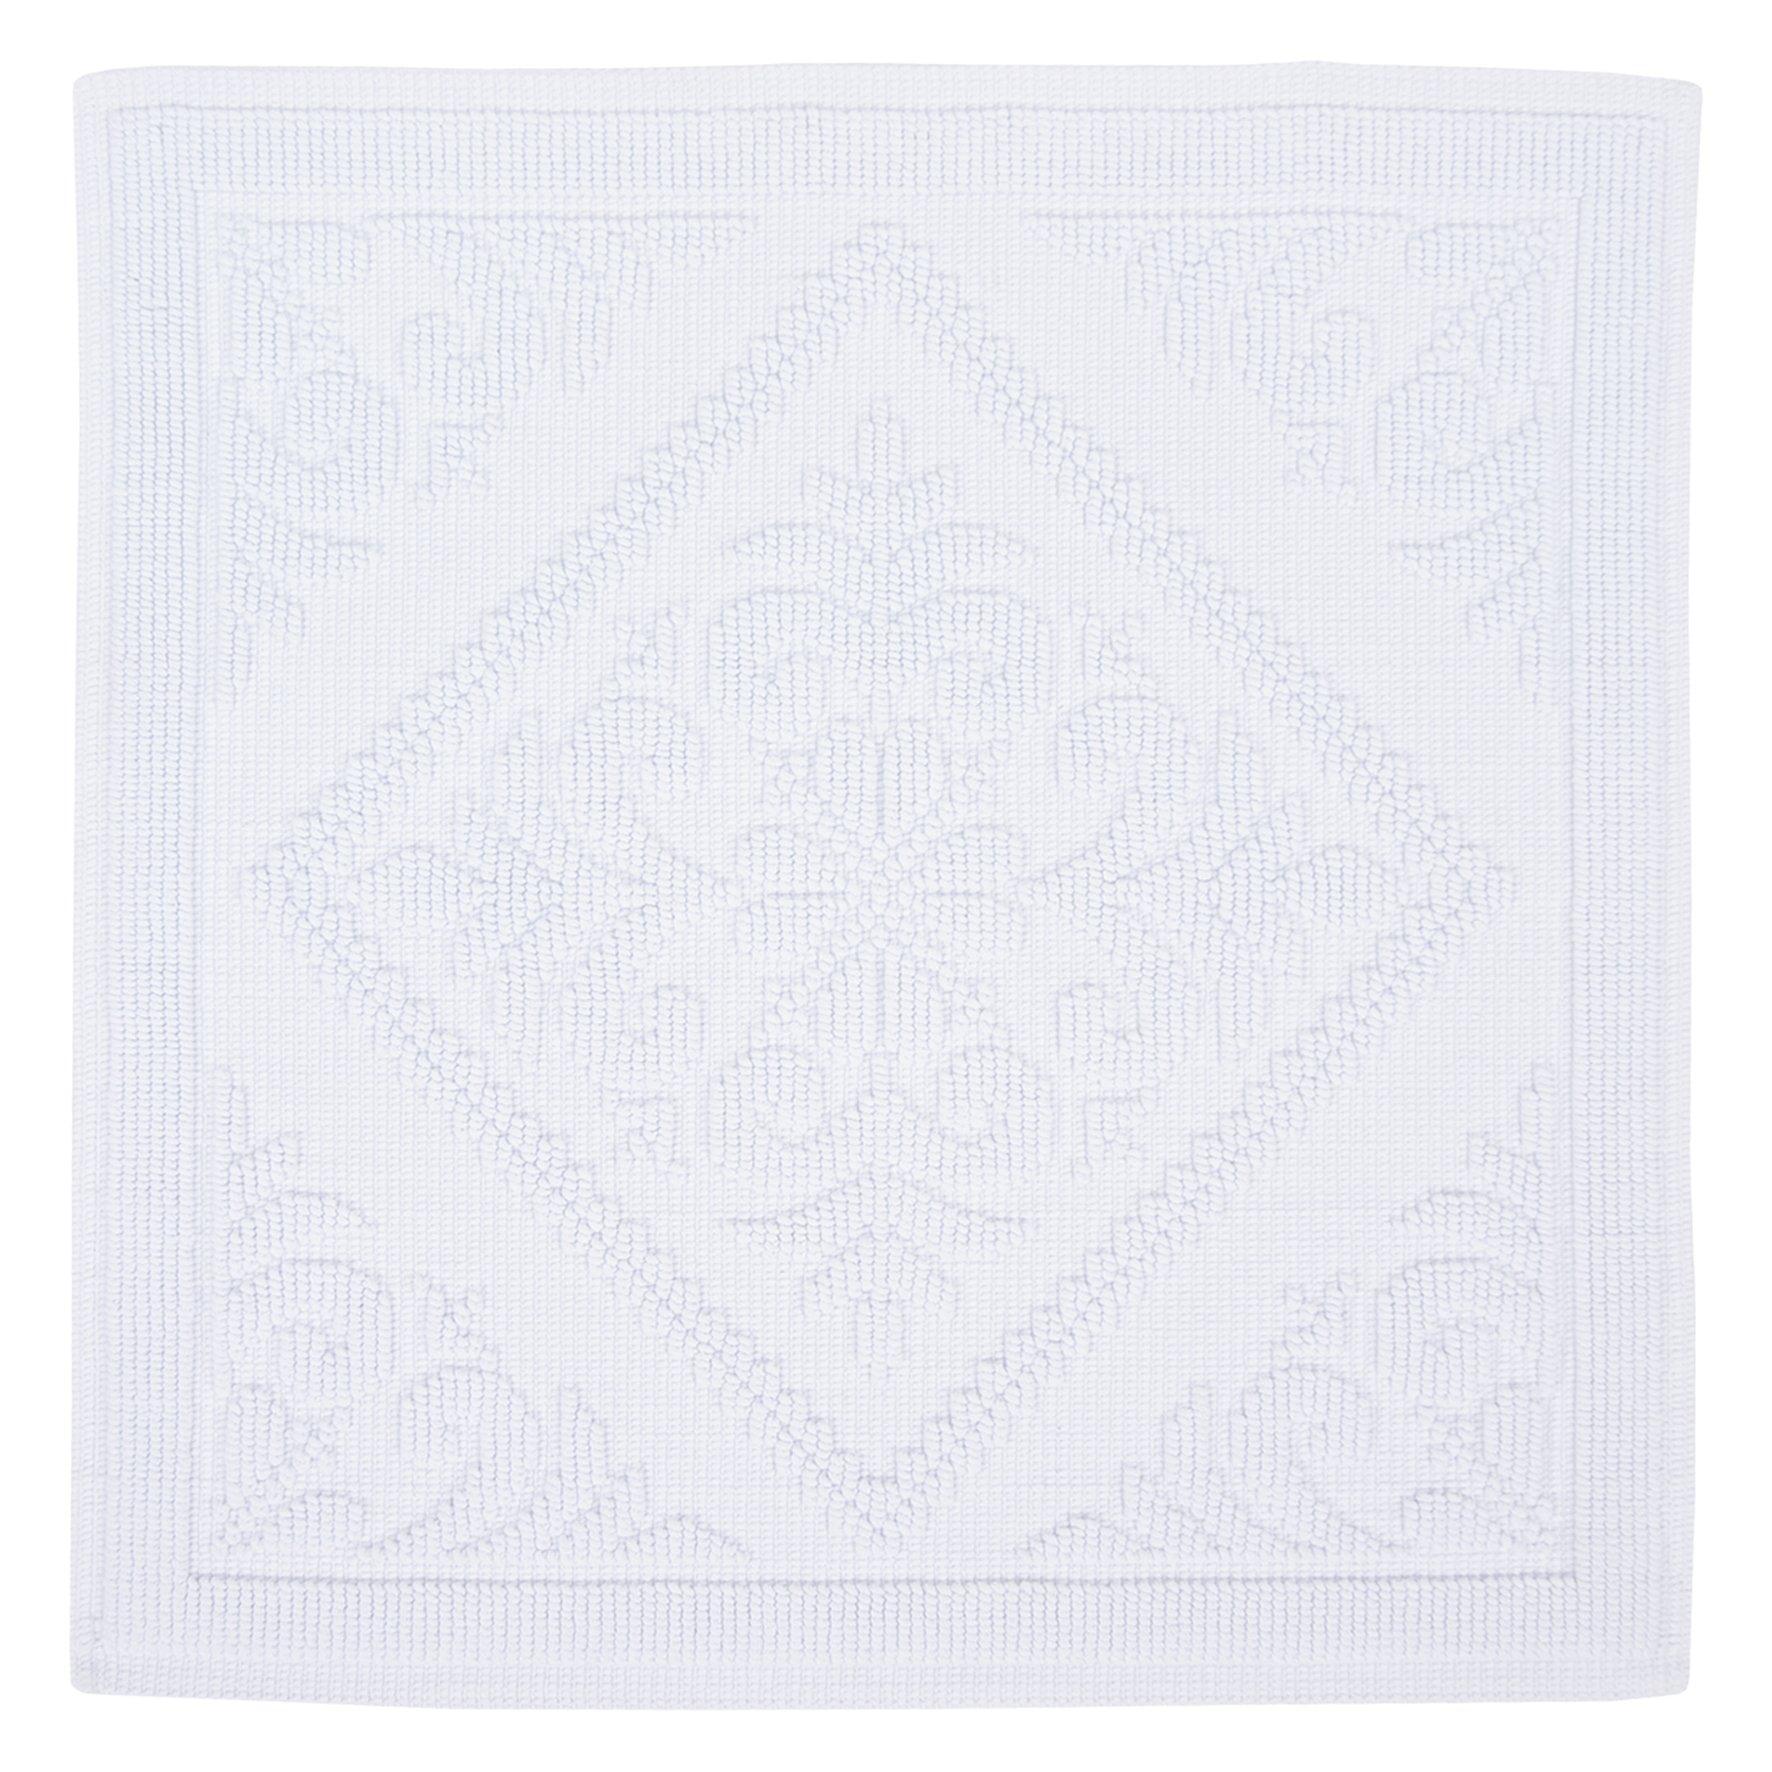 DIFFERNZ 31.102.56Domus Bath Mat, White by Differnz